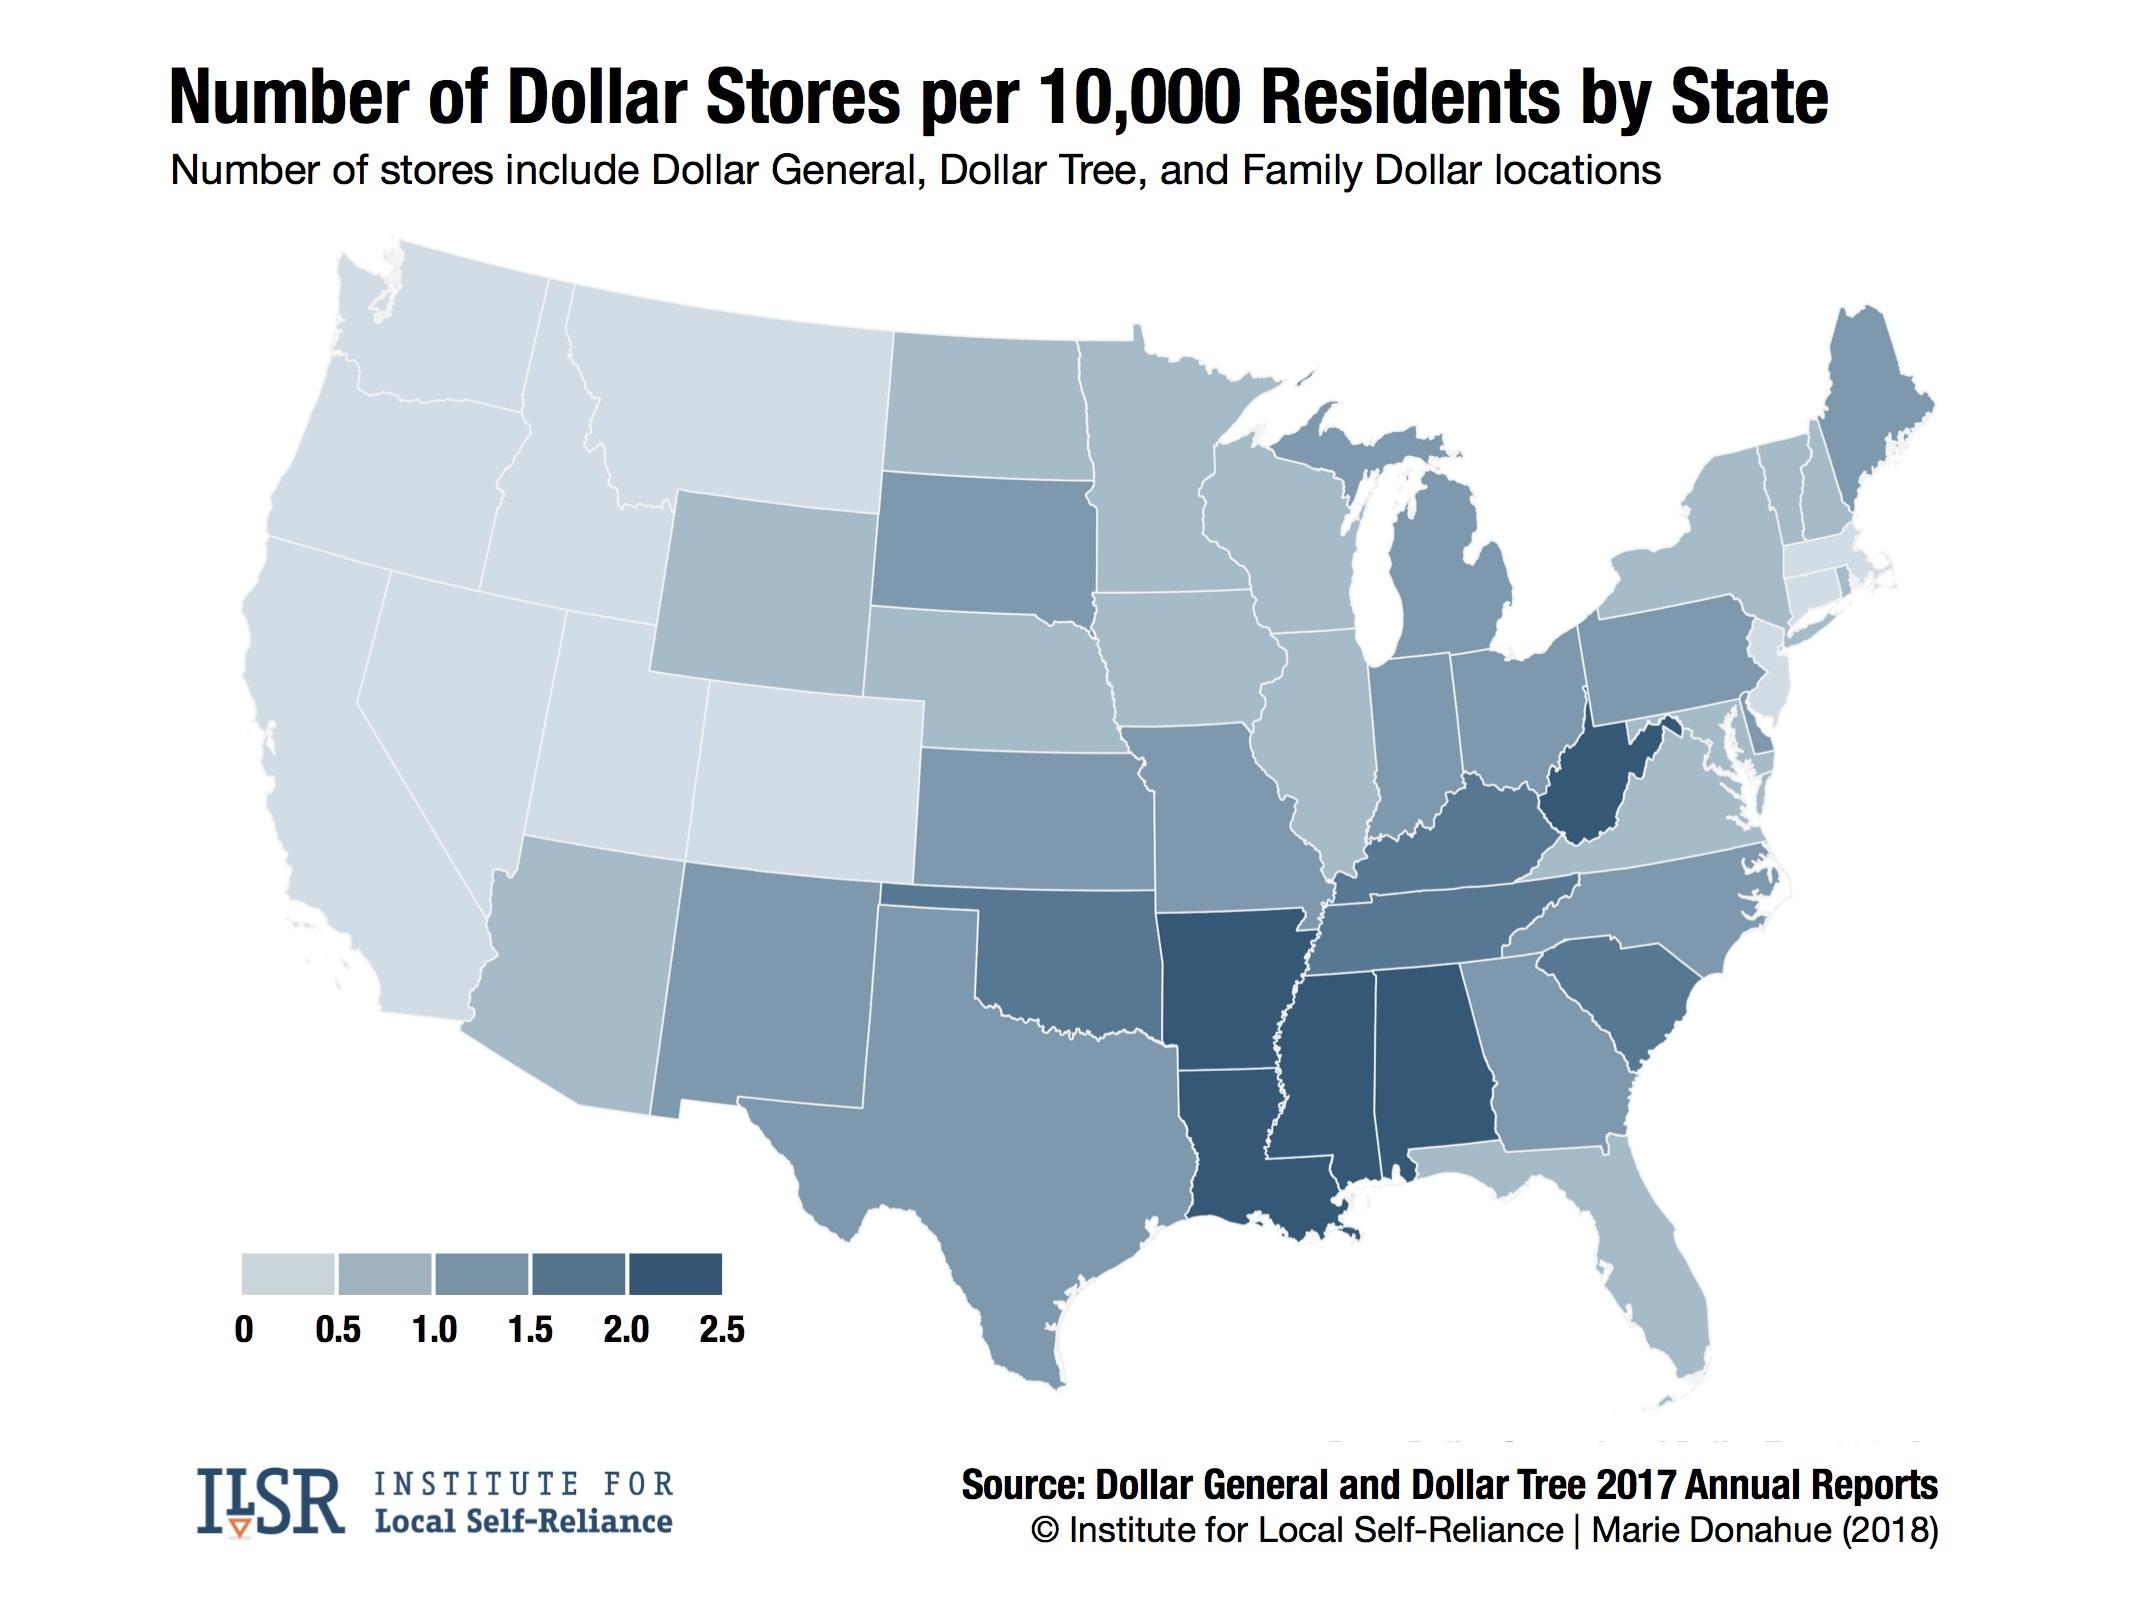 Dollar Stores Are Targeting Struggling Urban Neighborhoods